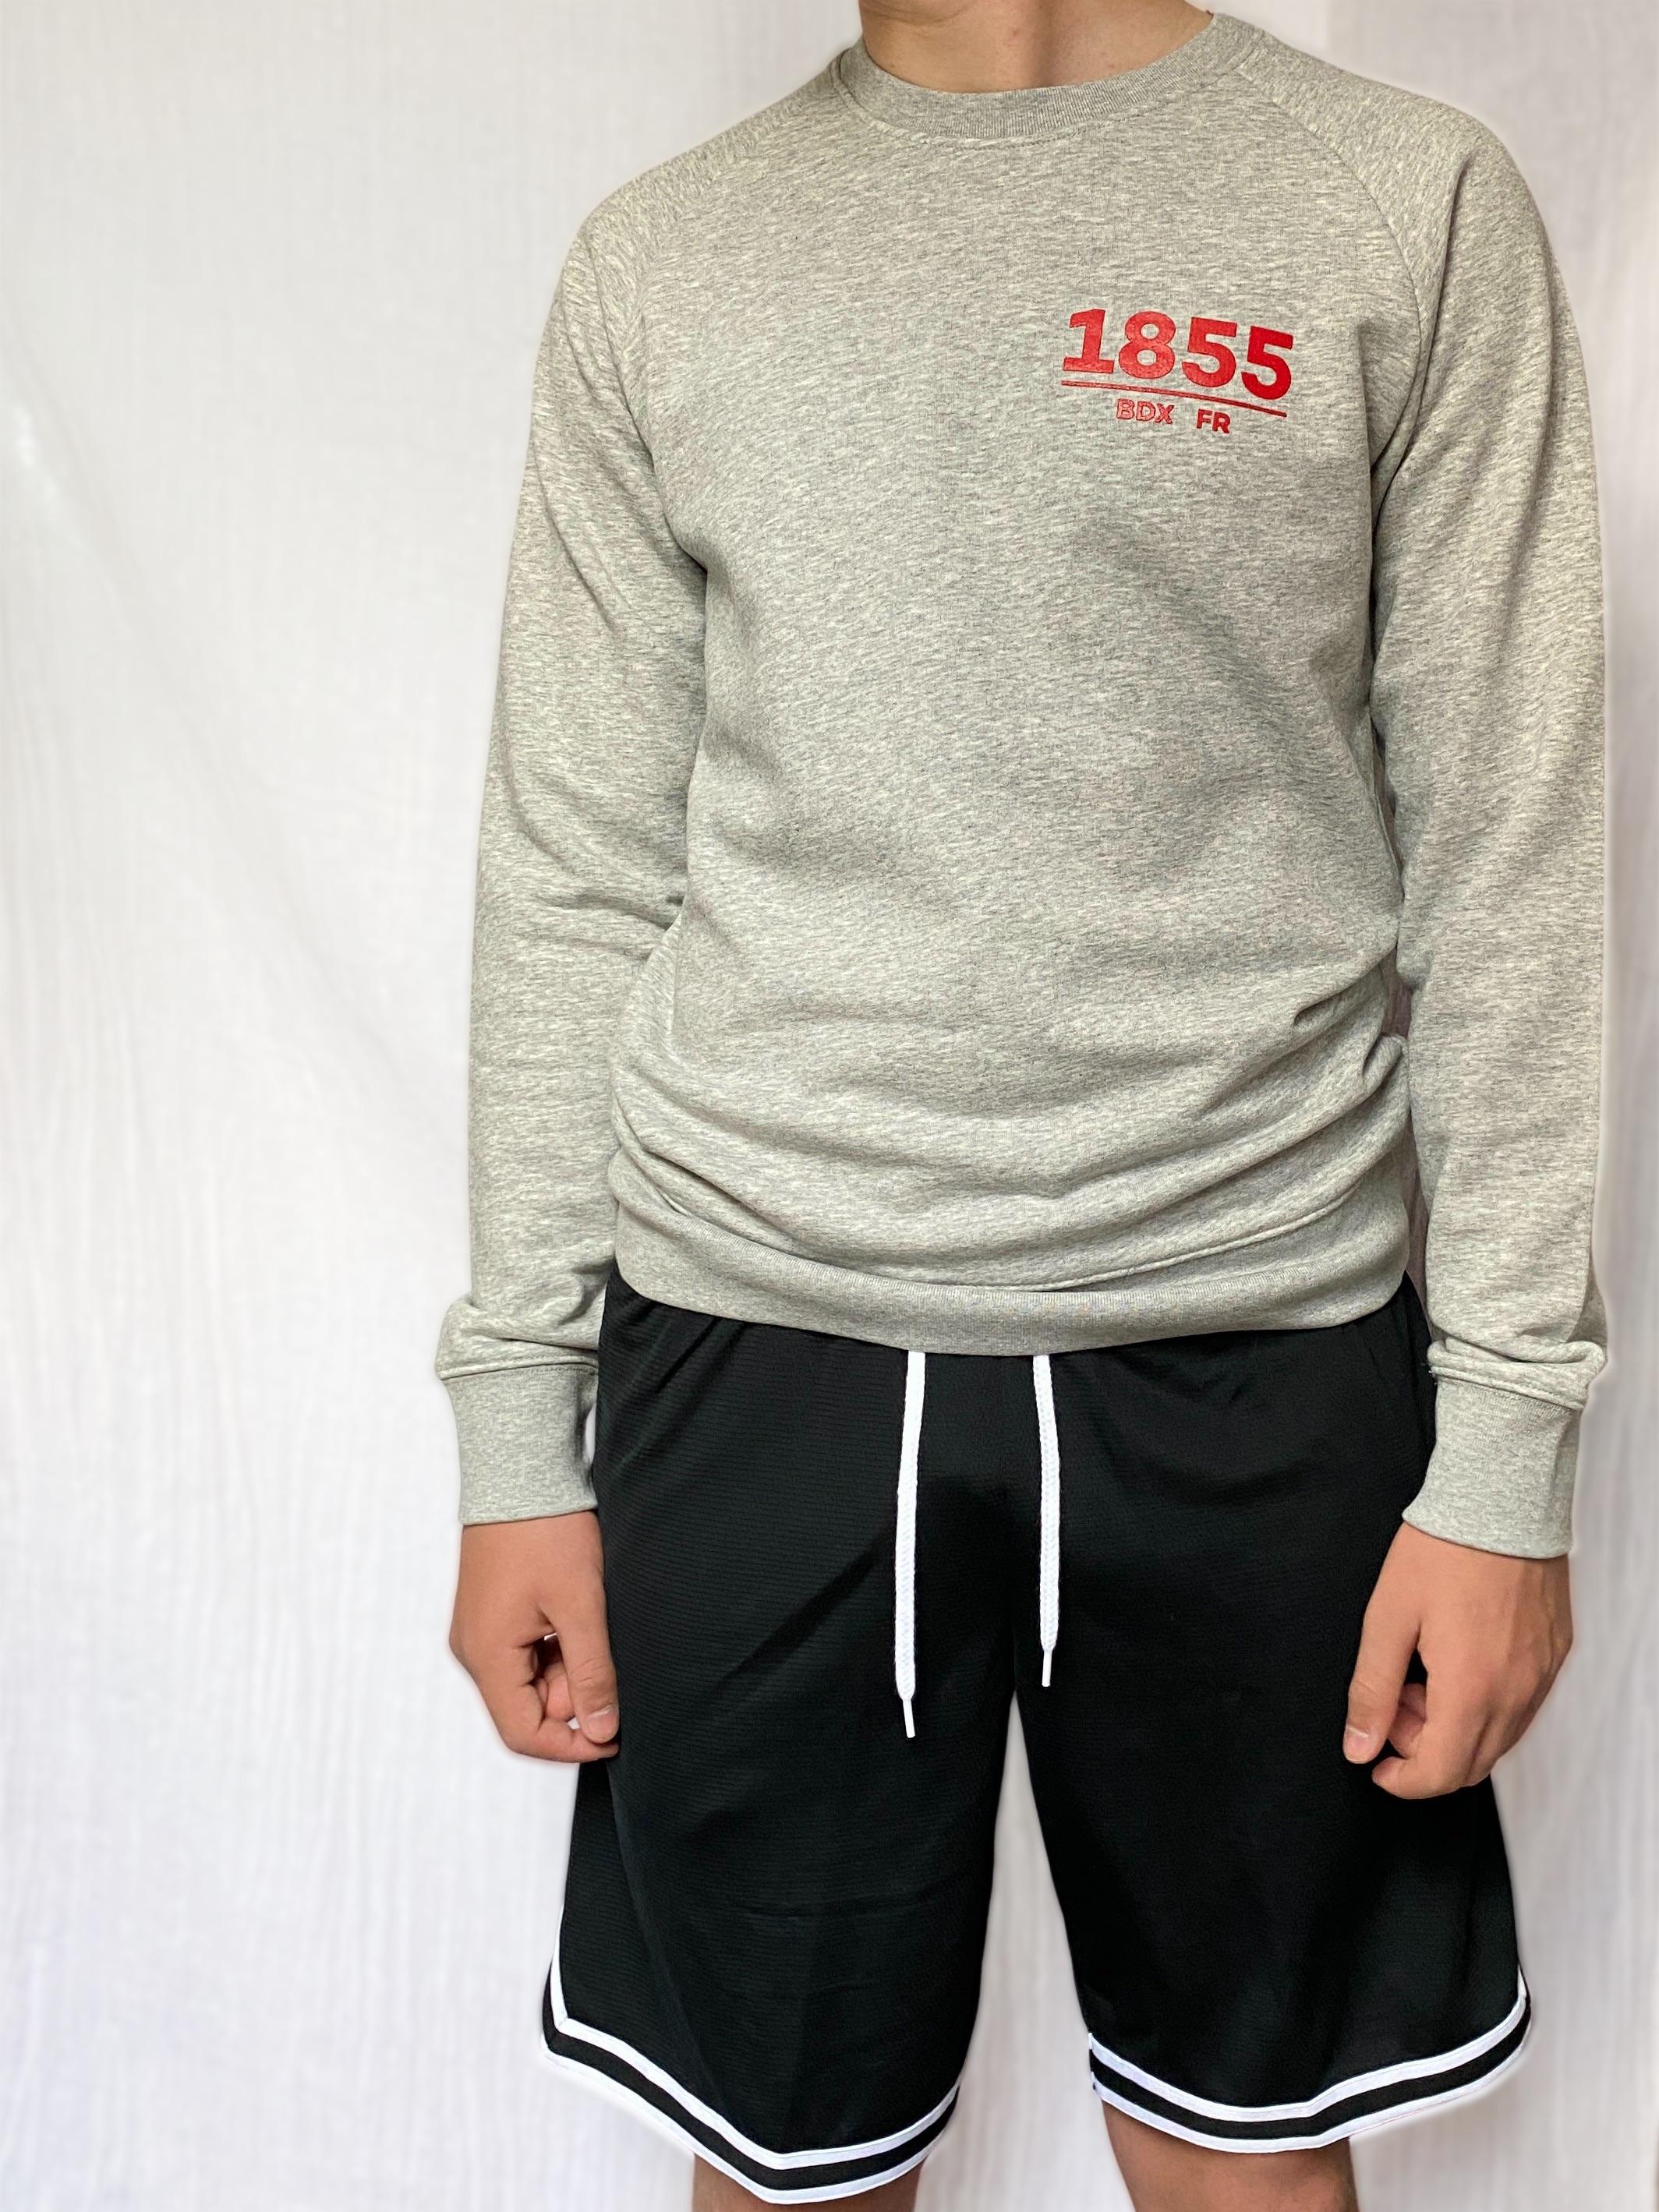 1855 bordeaux mens crew neck raglan sleeve sweatshirt